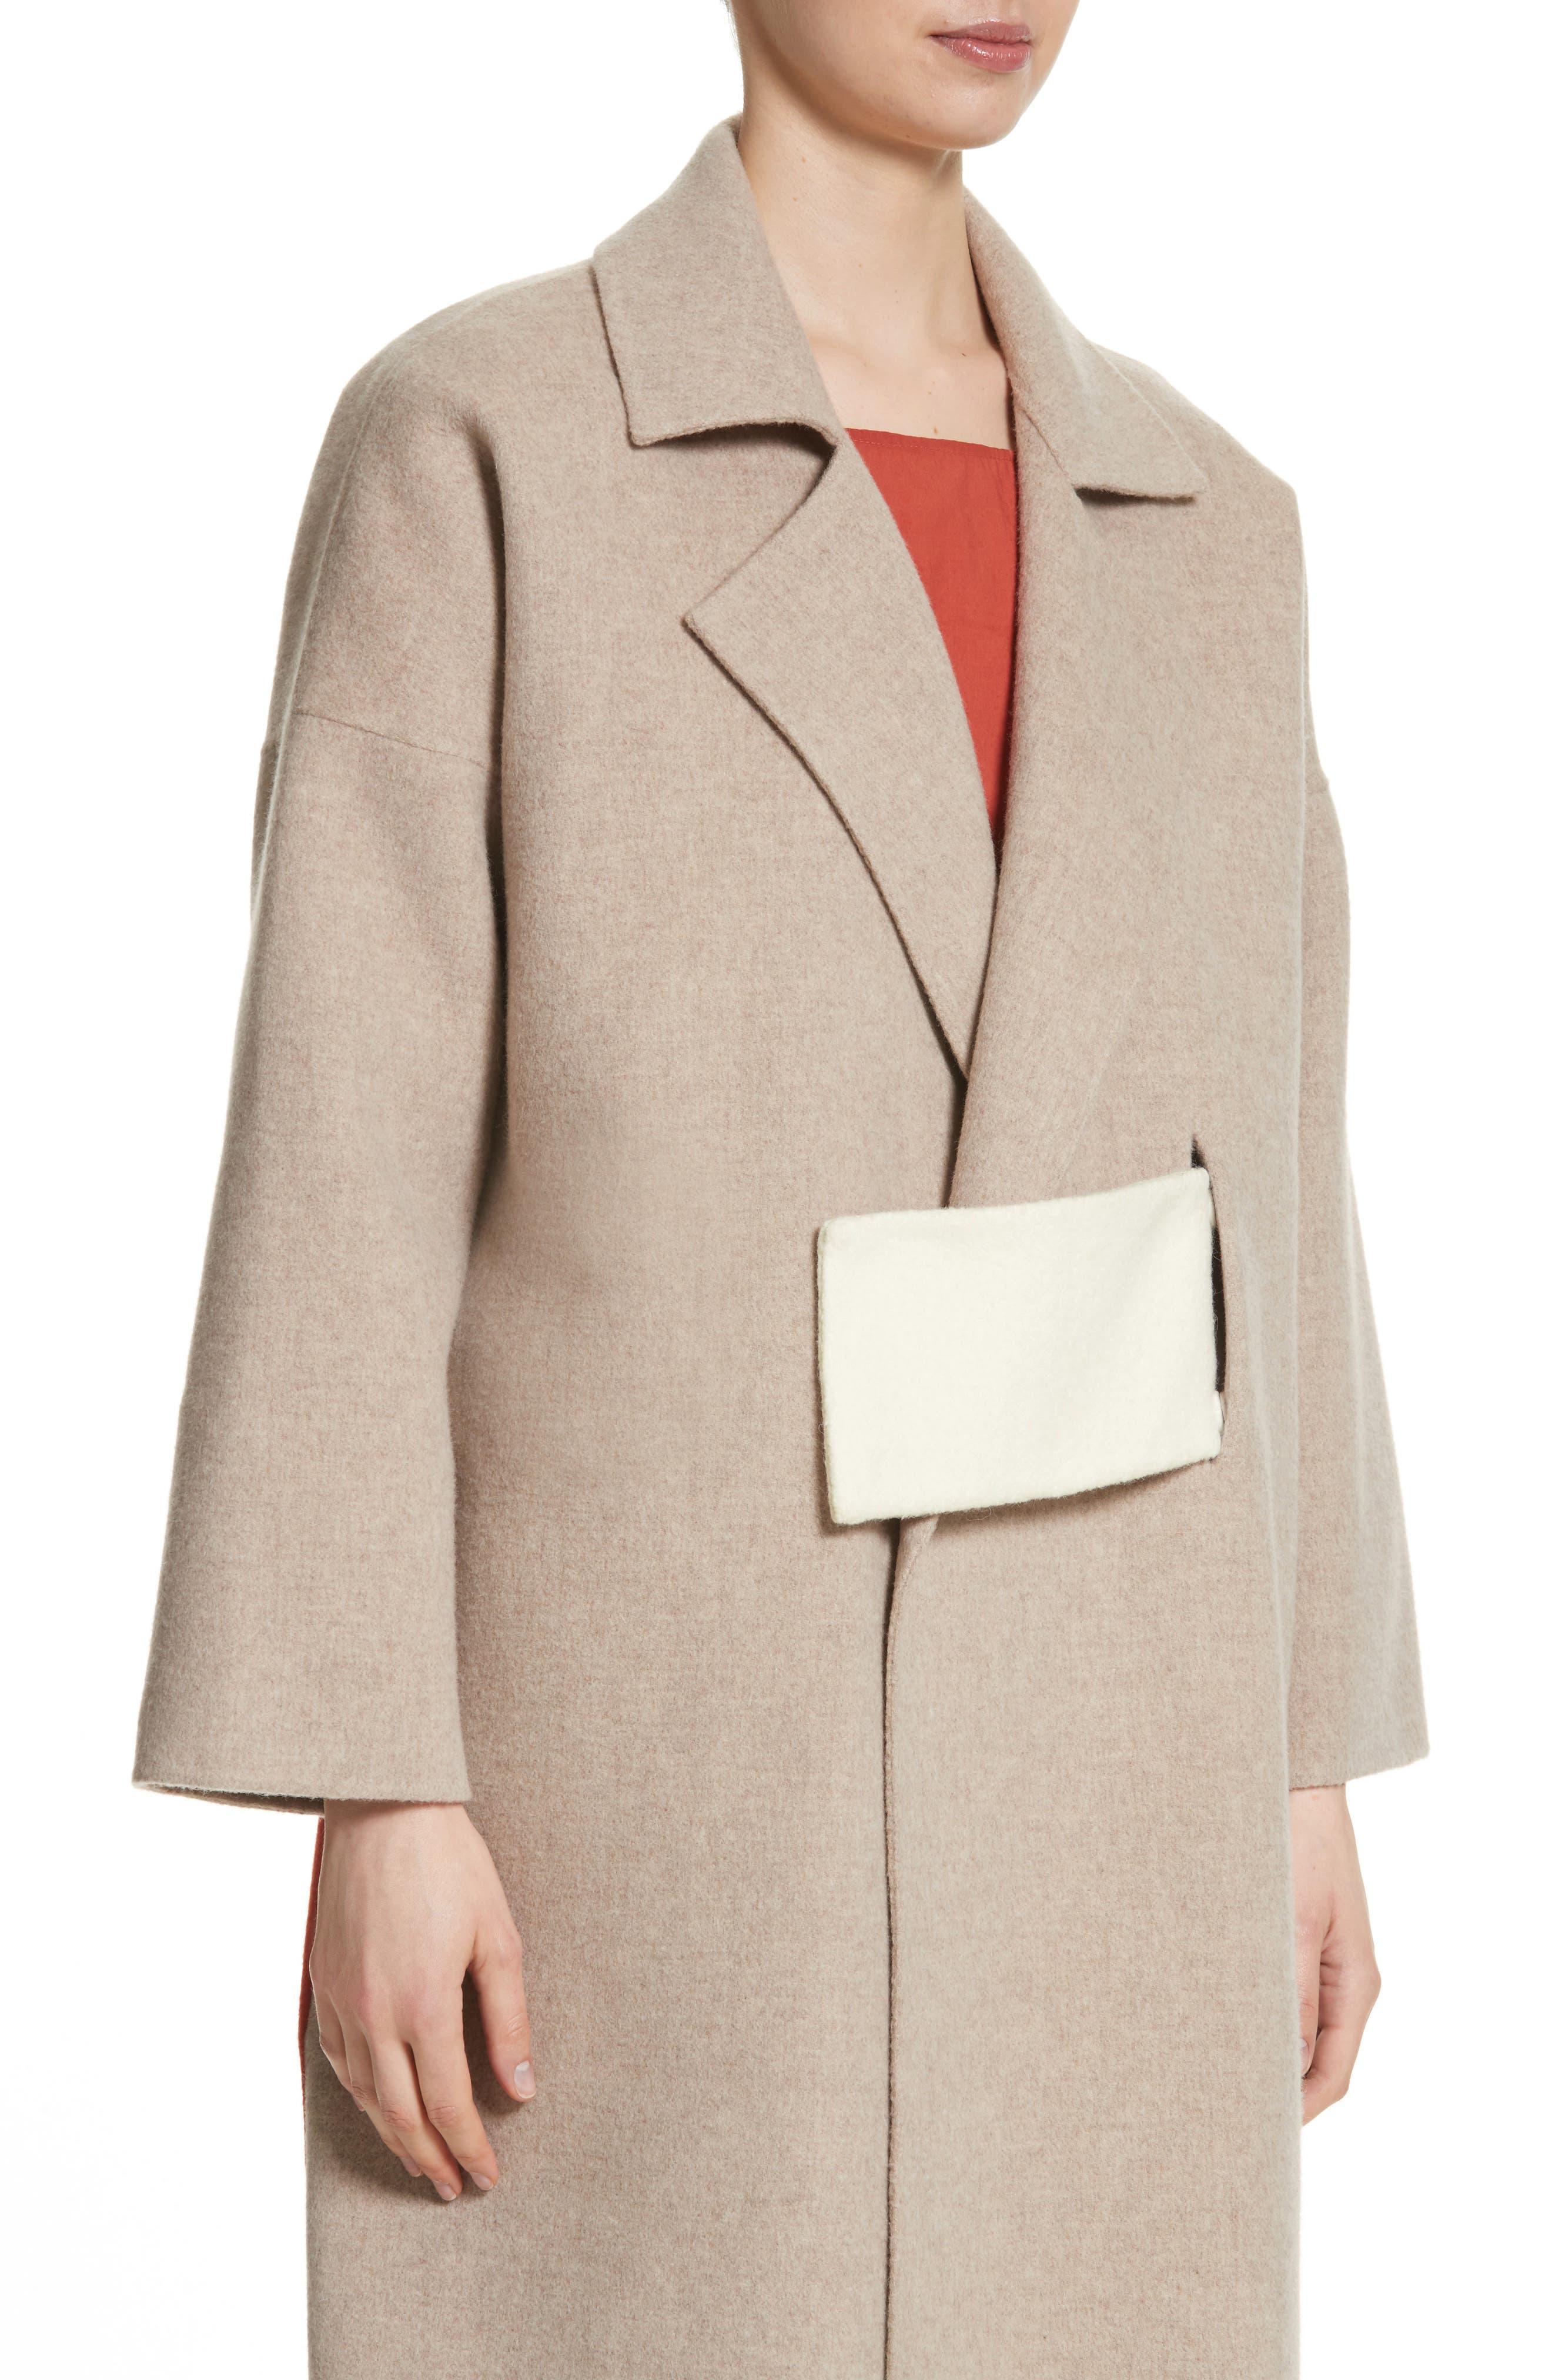 Kate Oversize Belted Coat,                             Alternate thumbnail 4, color,                             260